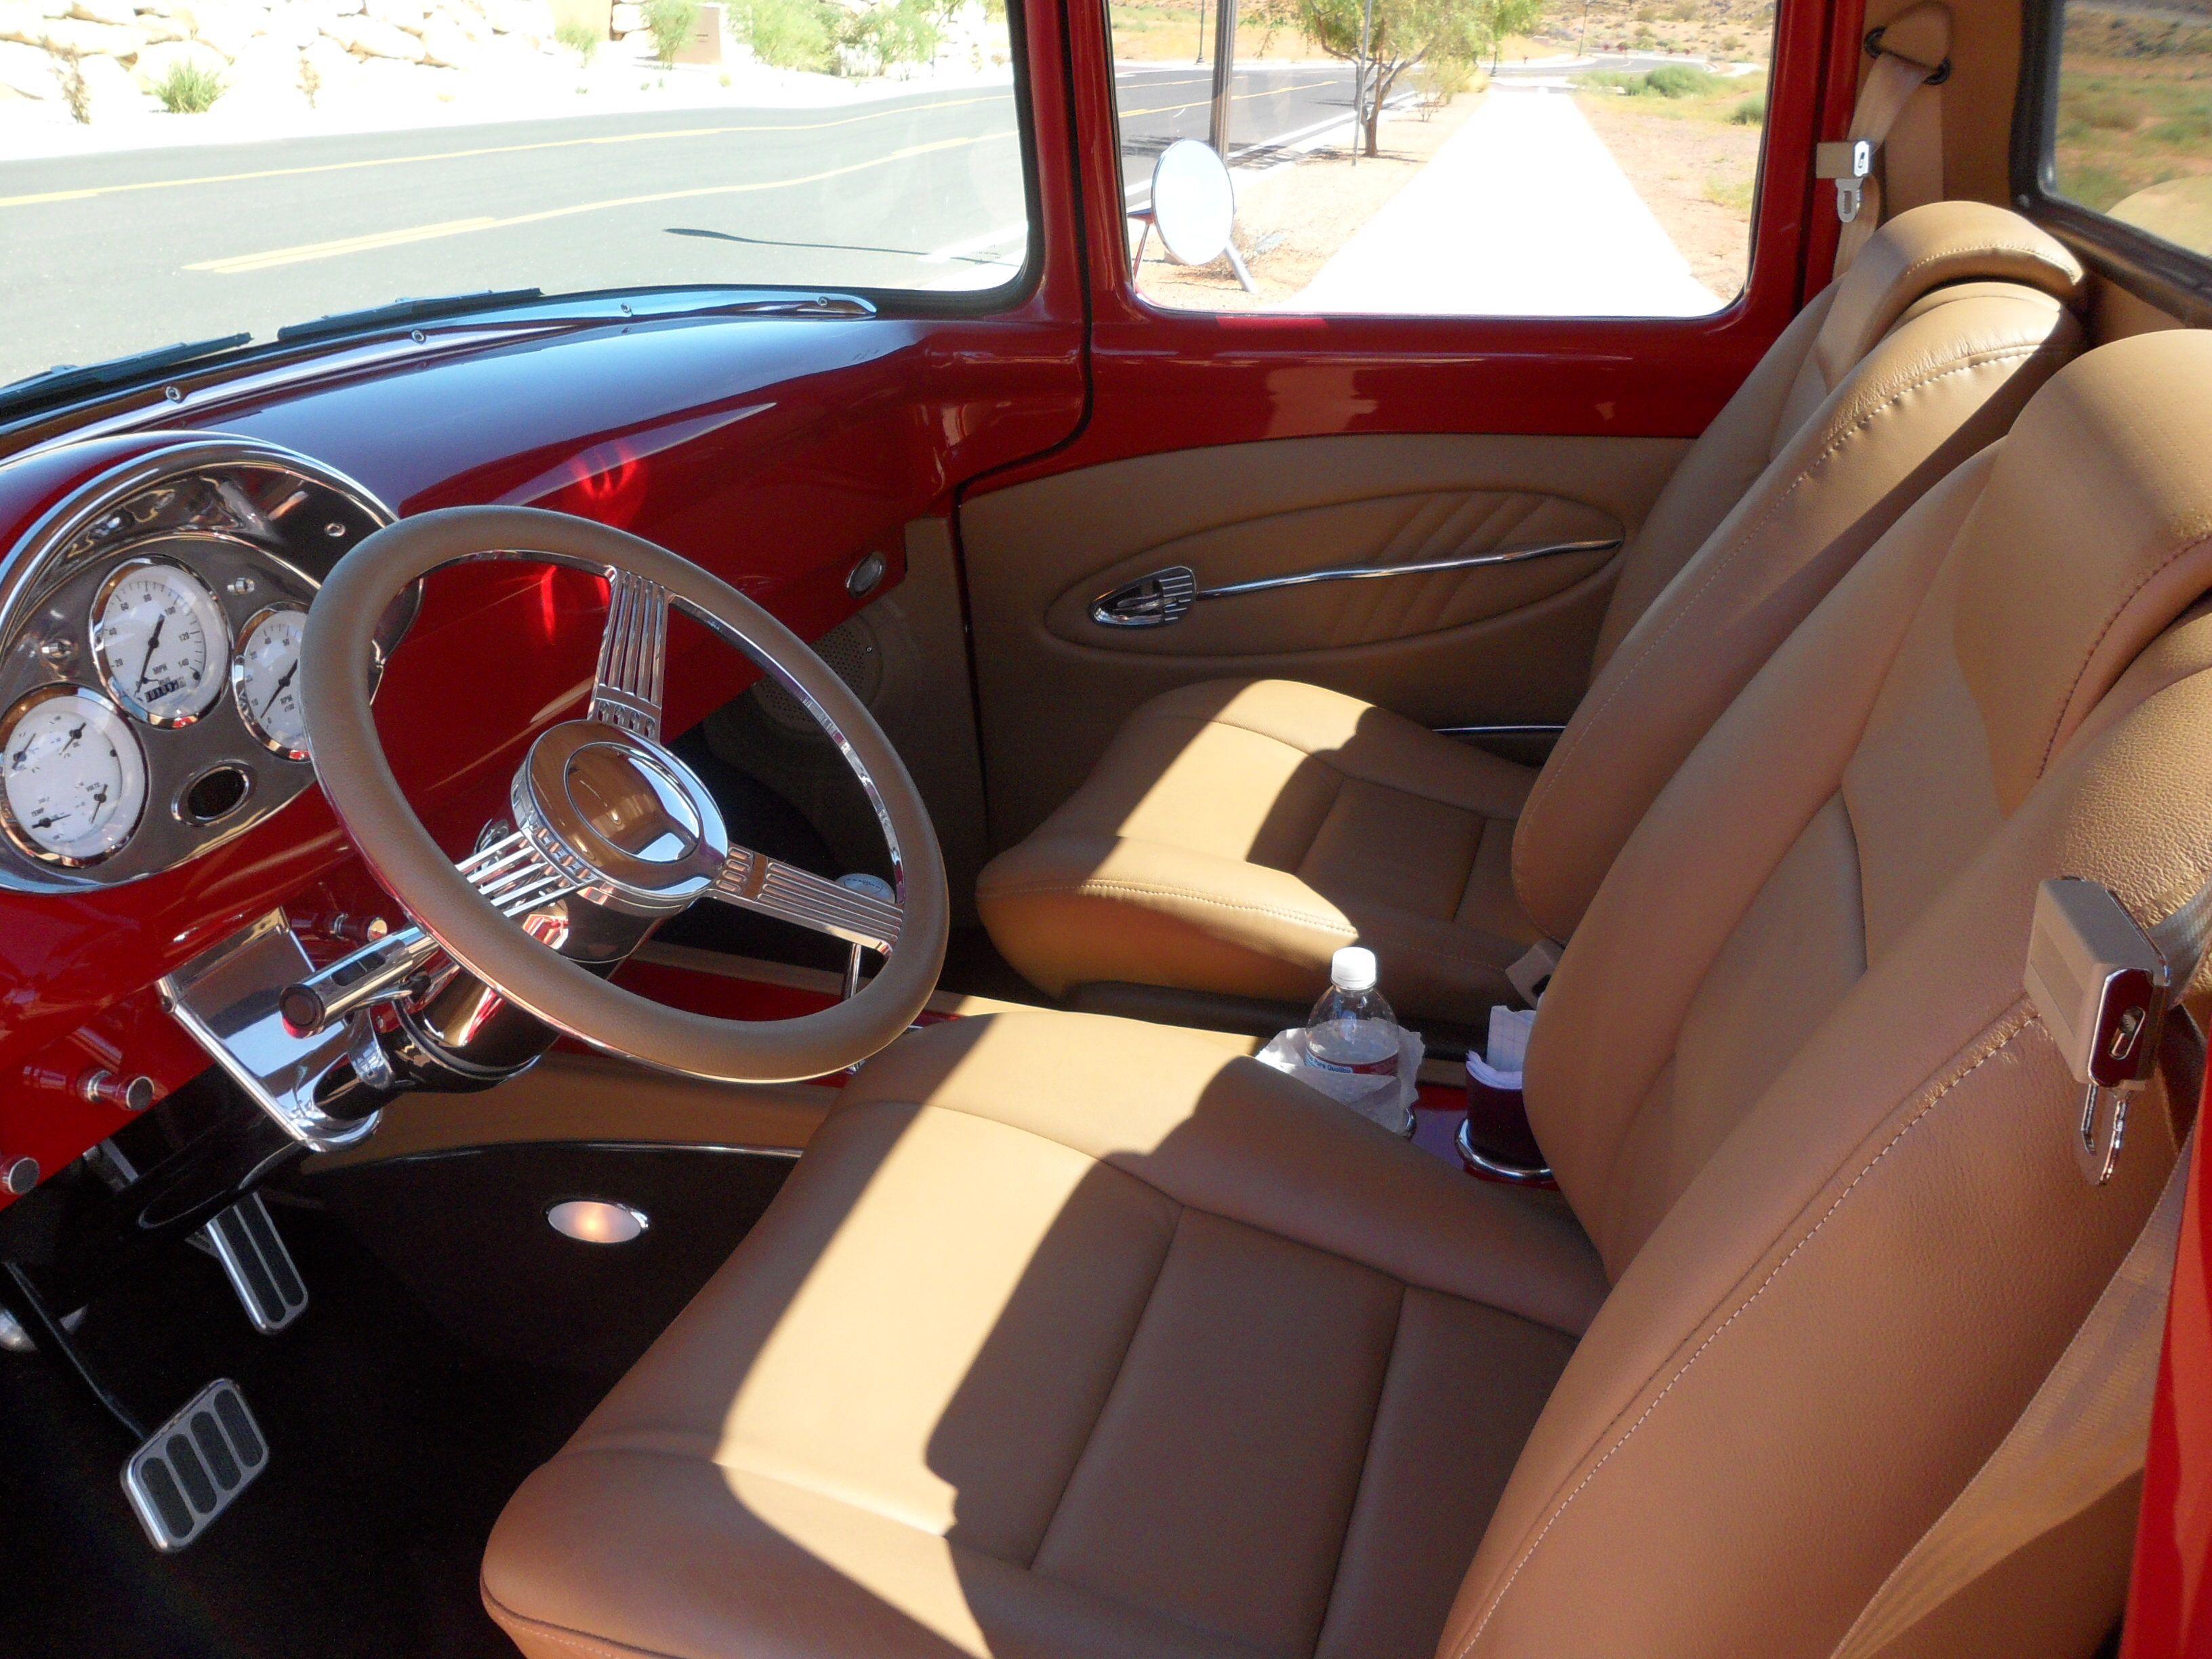 56 F100 Custom Interior Classic Truck Ford Interior Car Upholstery